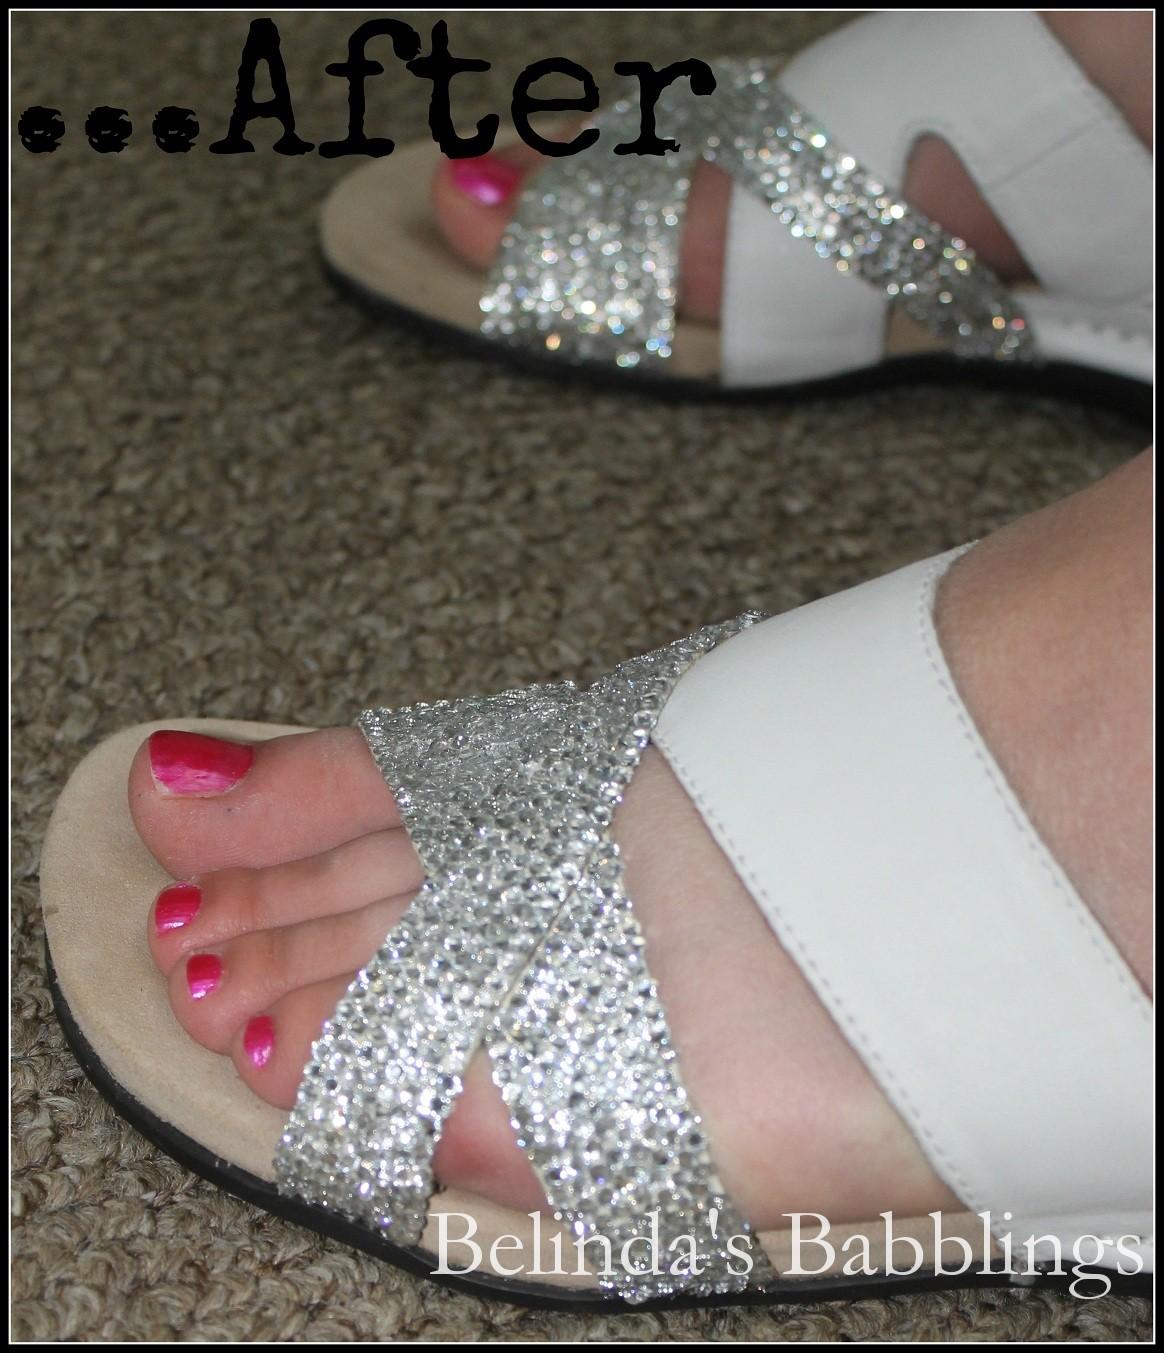 Belinda's Babblings: My DIY Rhinestone Sandals